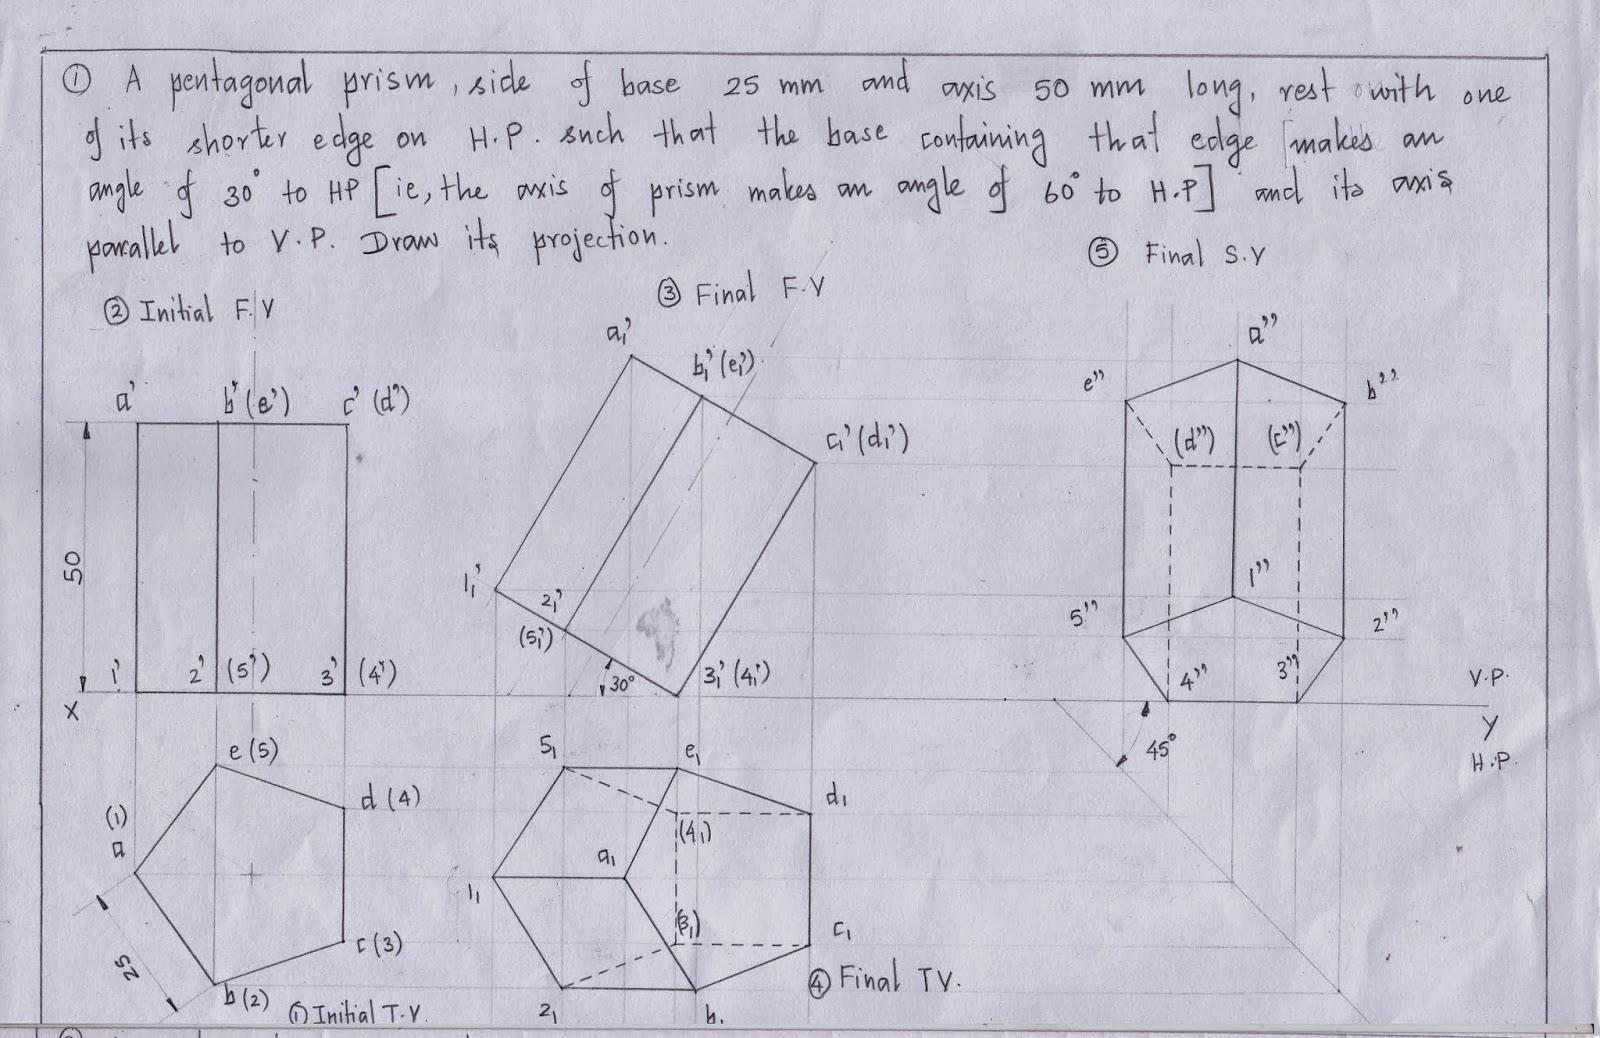 Planes Engineering Schematic Circuit Diagram Symbols Wow Schematics Graphics For Engineers Projection Of Solids Rh Kceengineeringgraphics Blogspot Com Us Pet Recipes